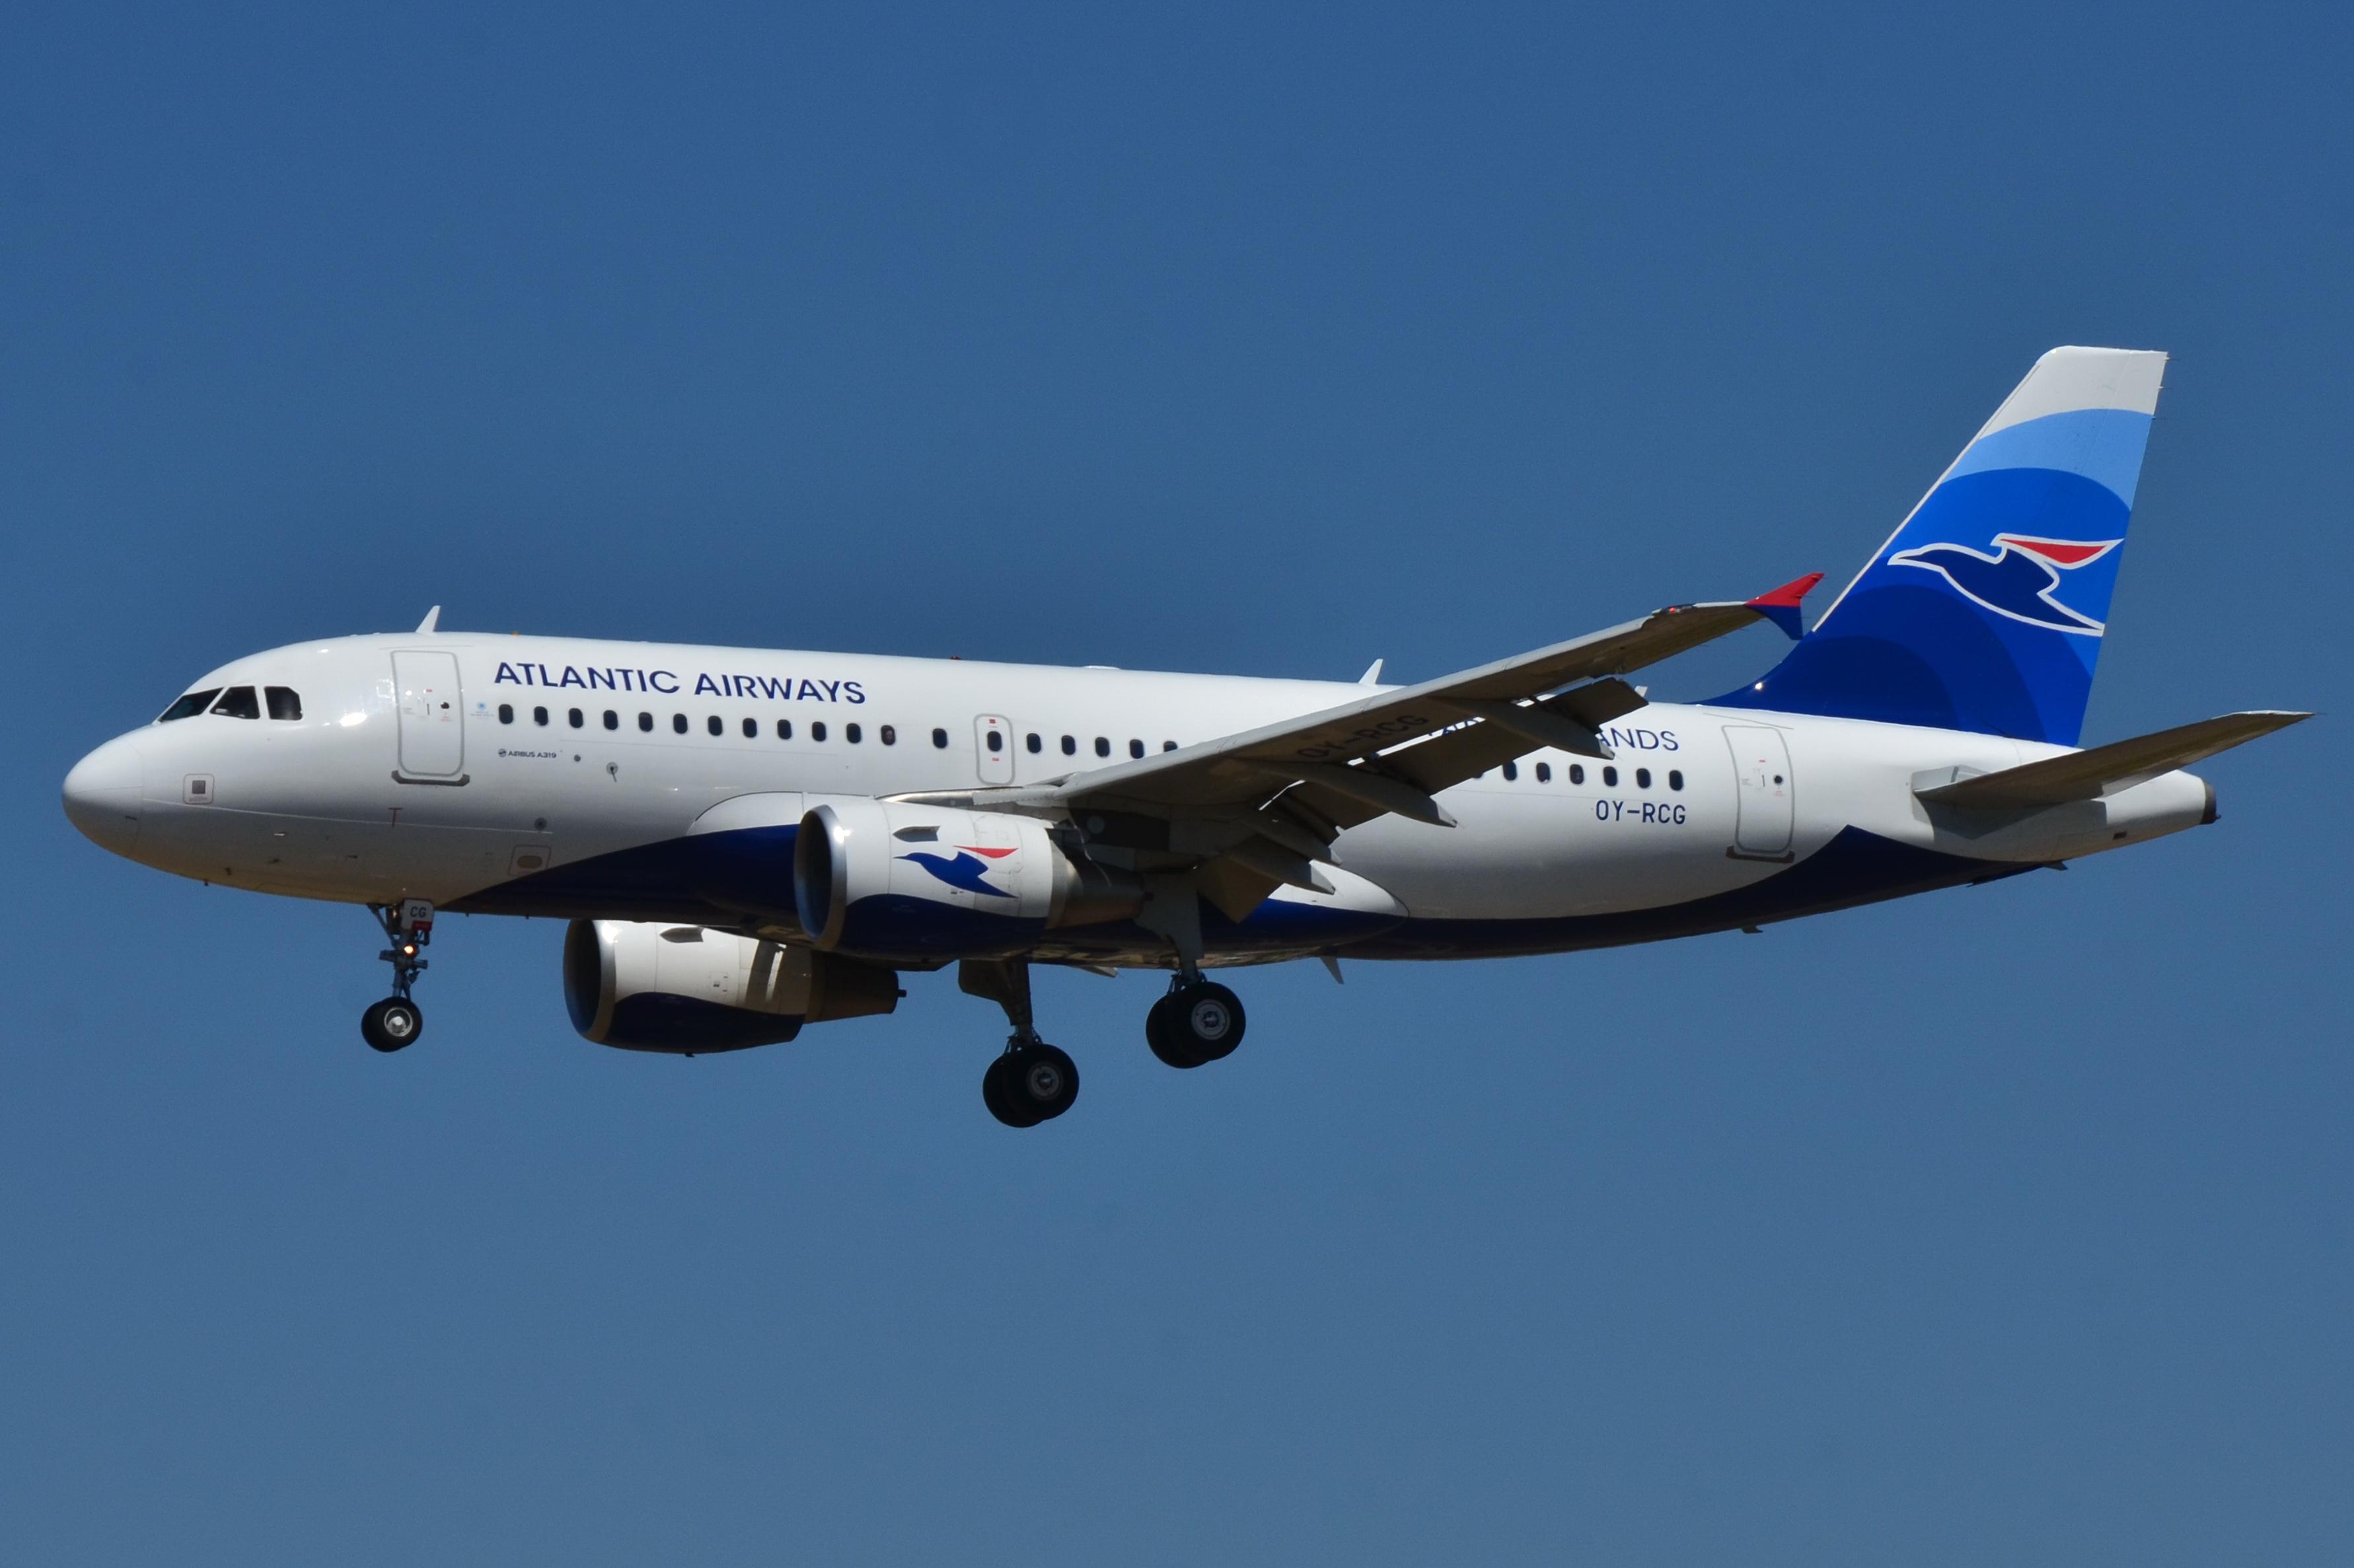 En Airbus A319-100 fra Atlantic Airways. Foto: Laurent Errera